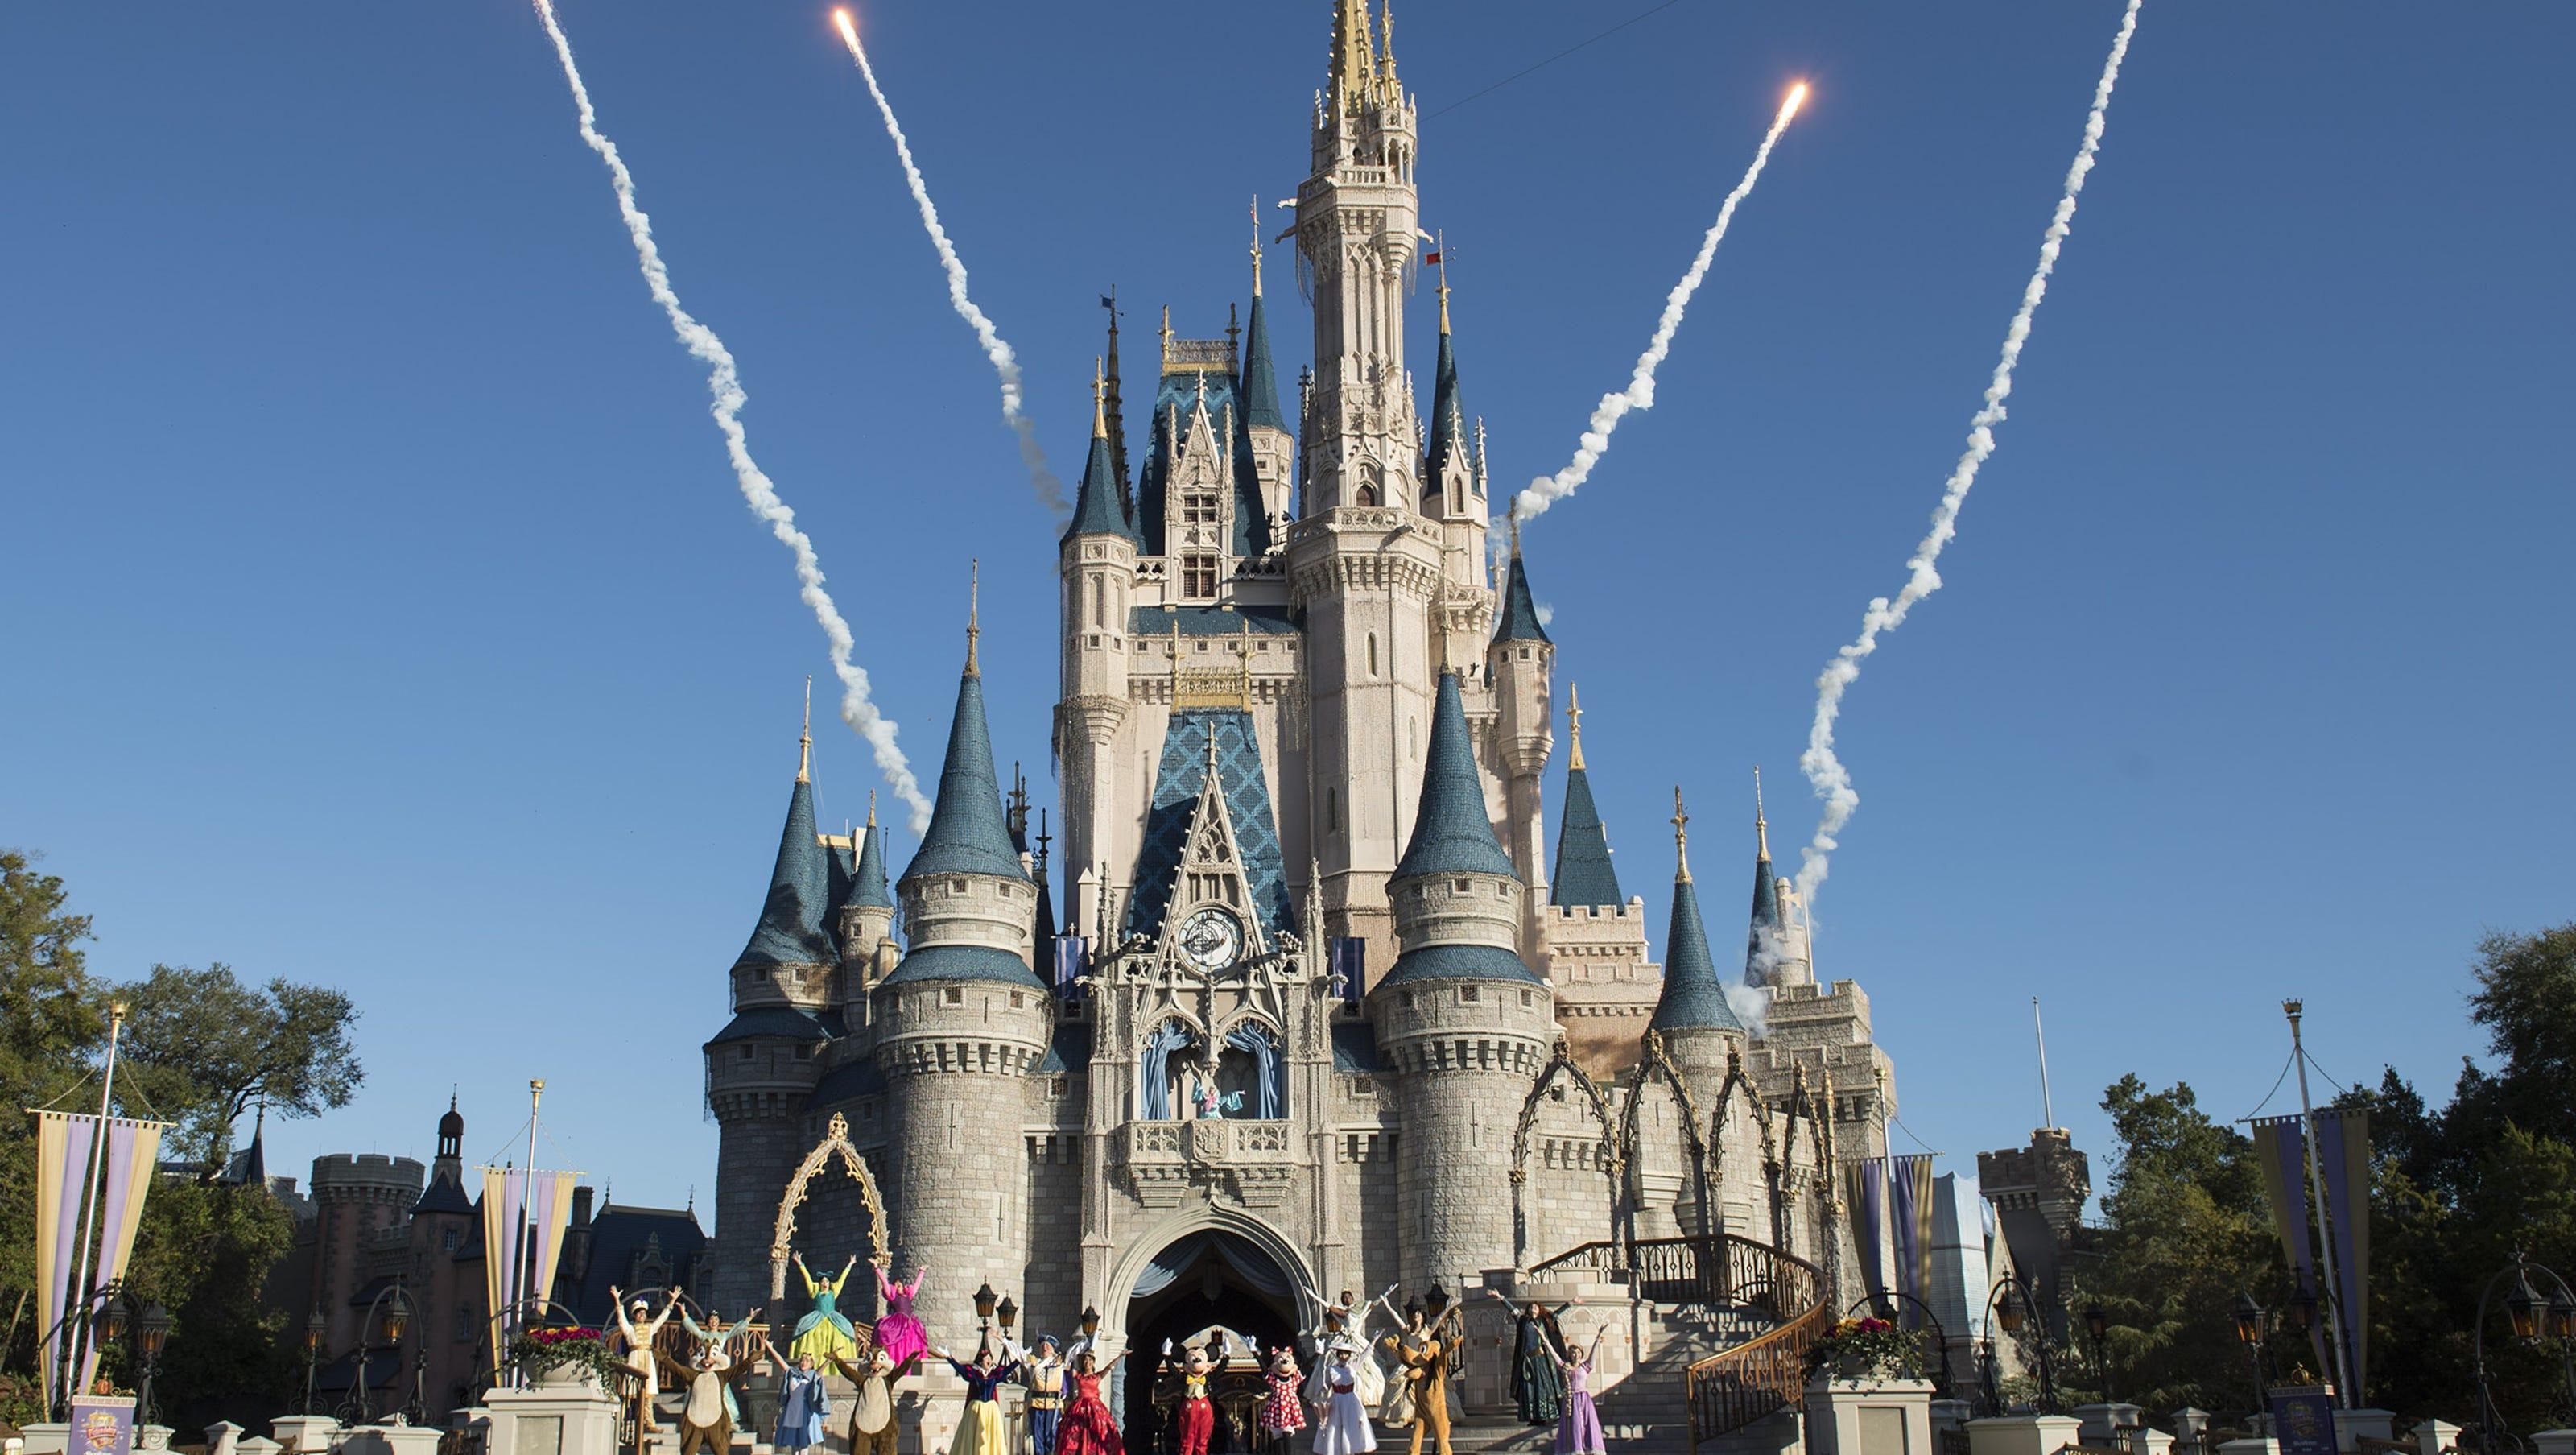 Disney World Price Increase 2018 Tickets Rise For Disney World